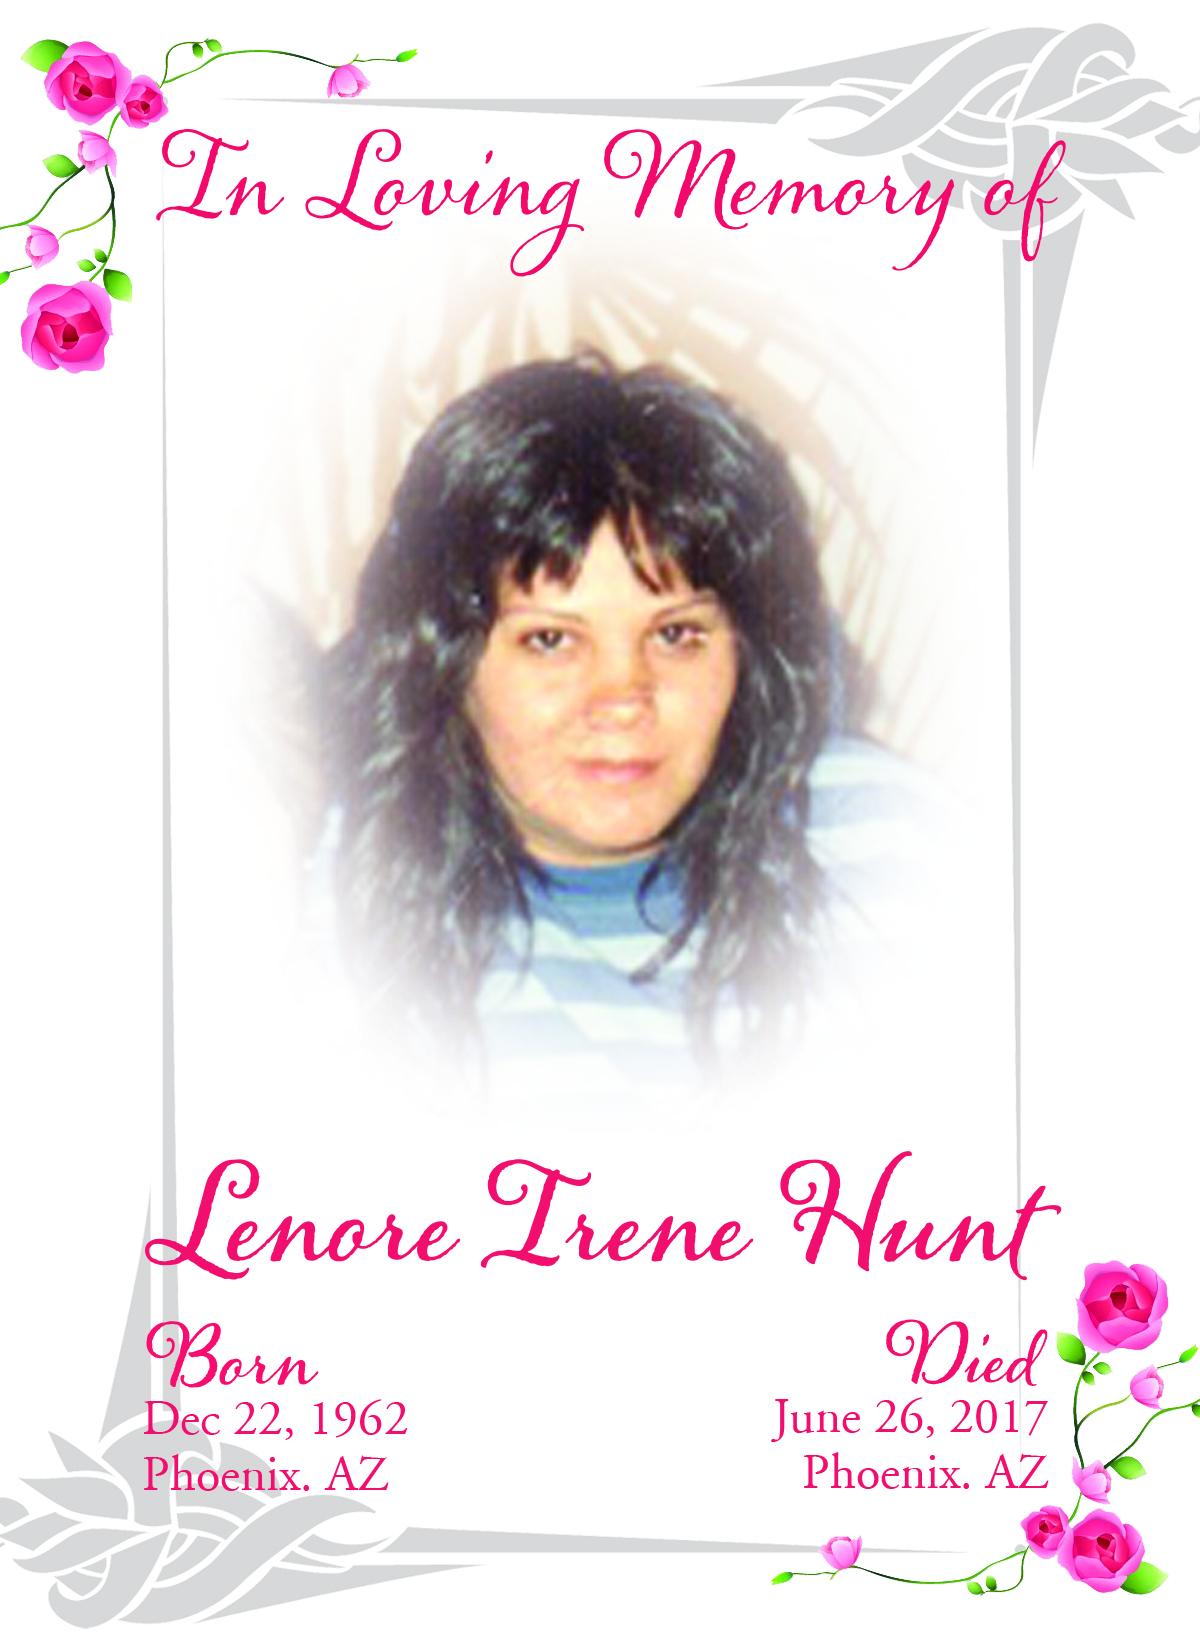 Lenore Irene Hunt